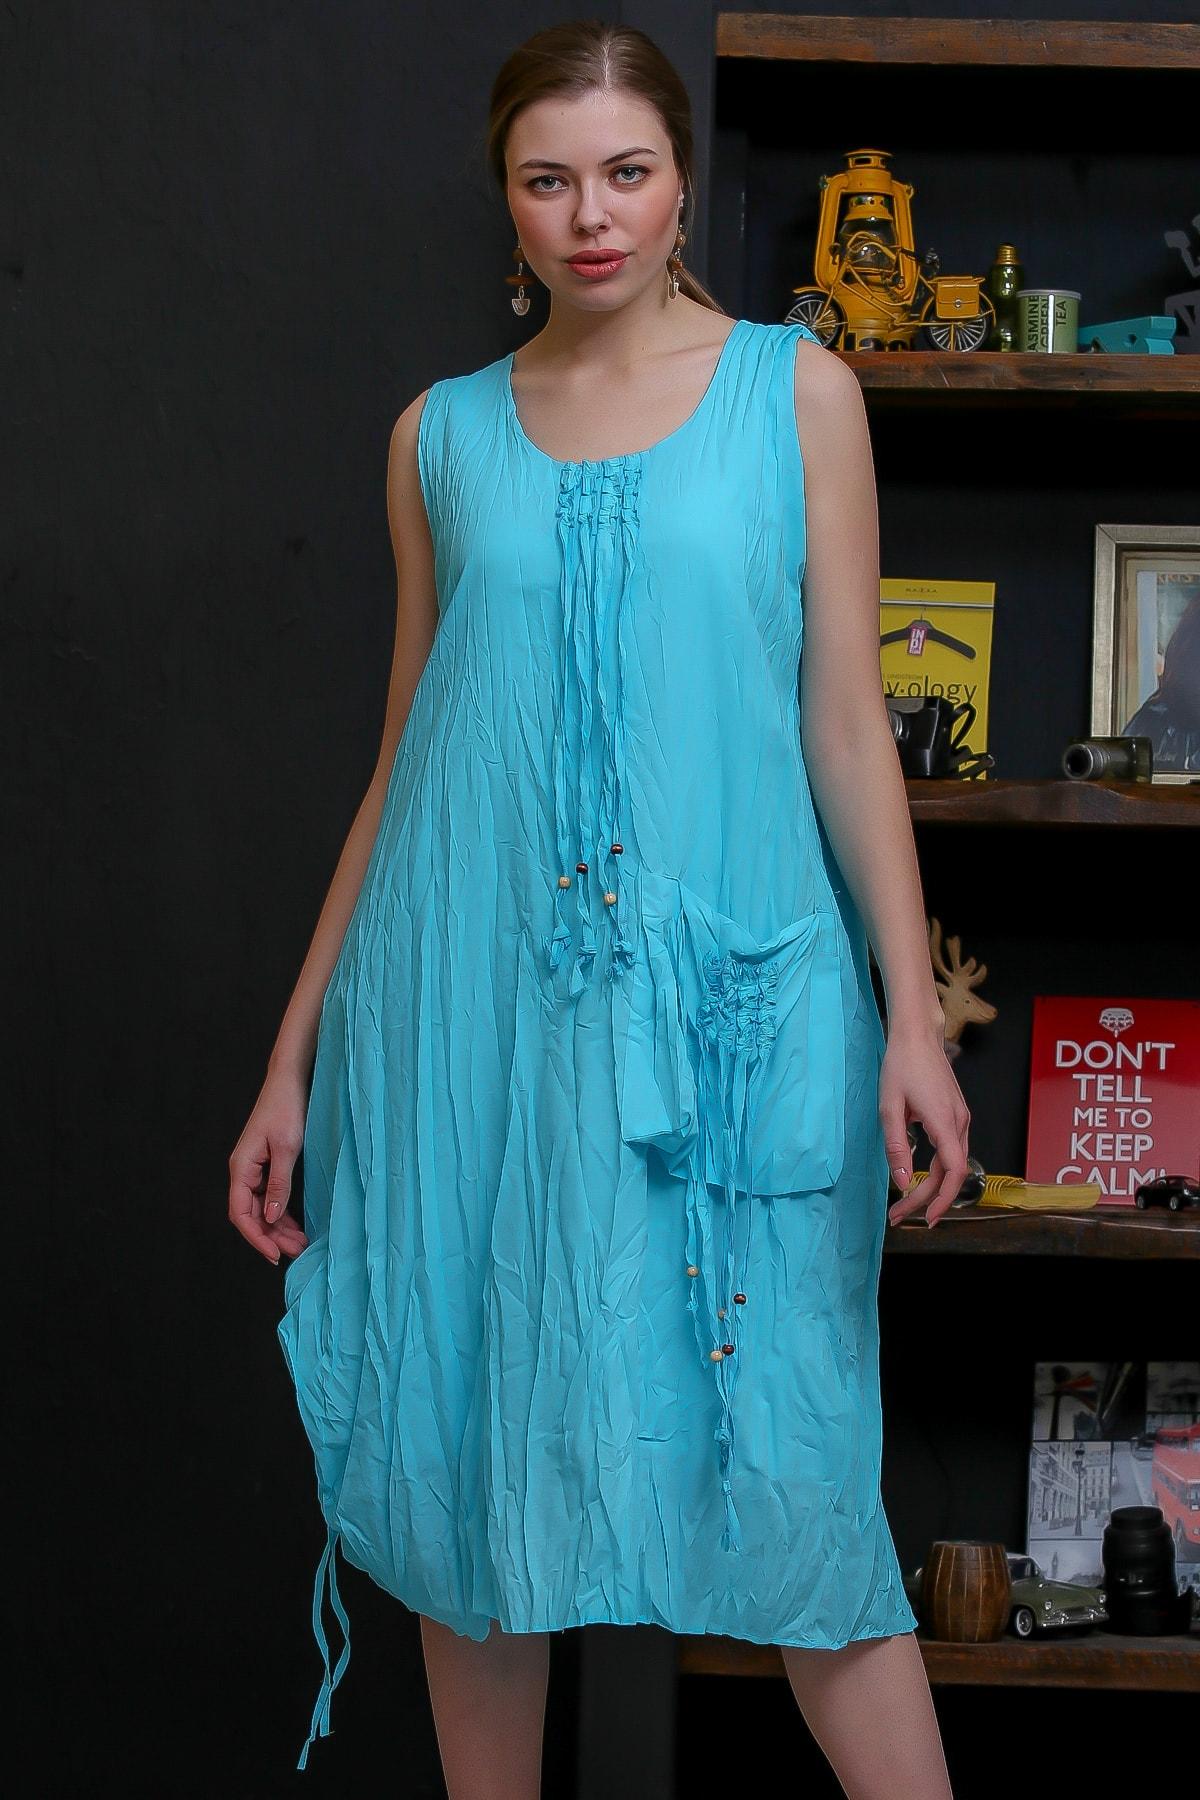 Chiccy Kadın Turkuaz Ahşap Boncuklu Biye Detaylı Dev Cepli Salaş Astarlı Dokuma Elbise M10160000EL95751